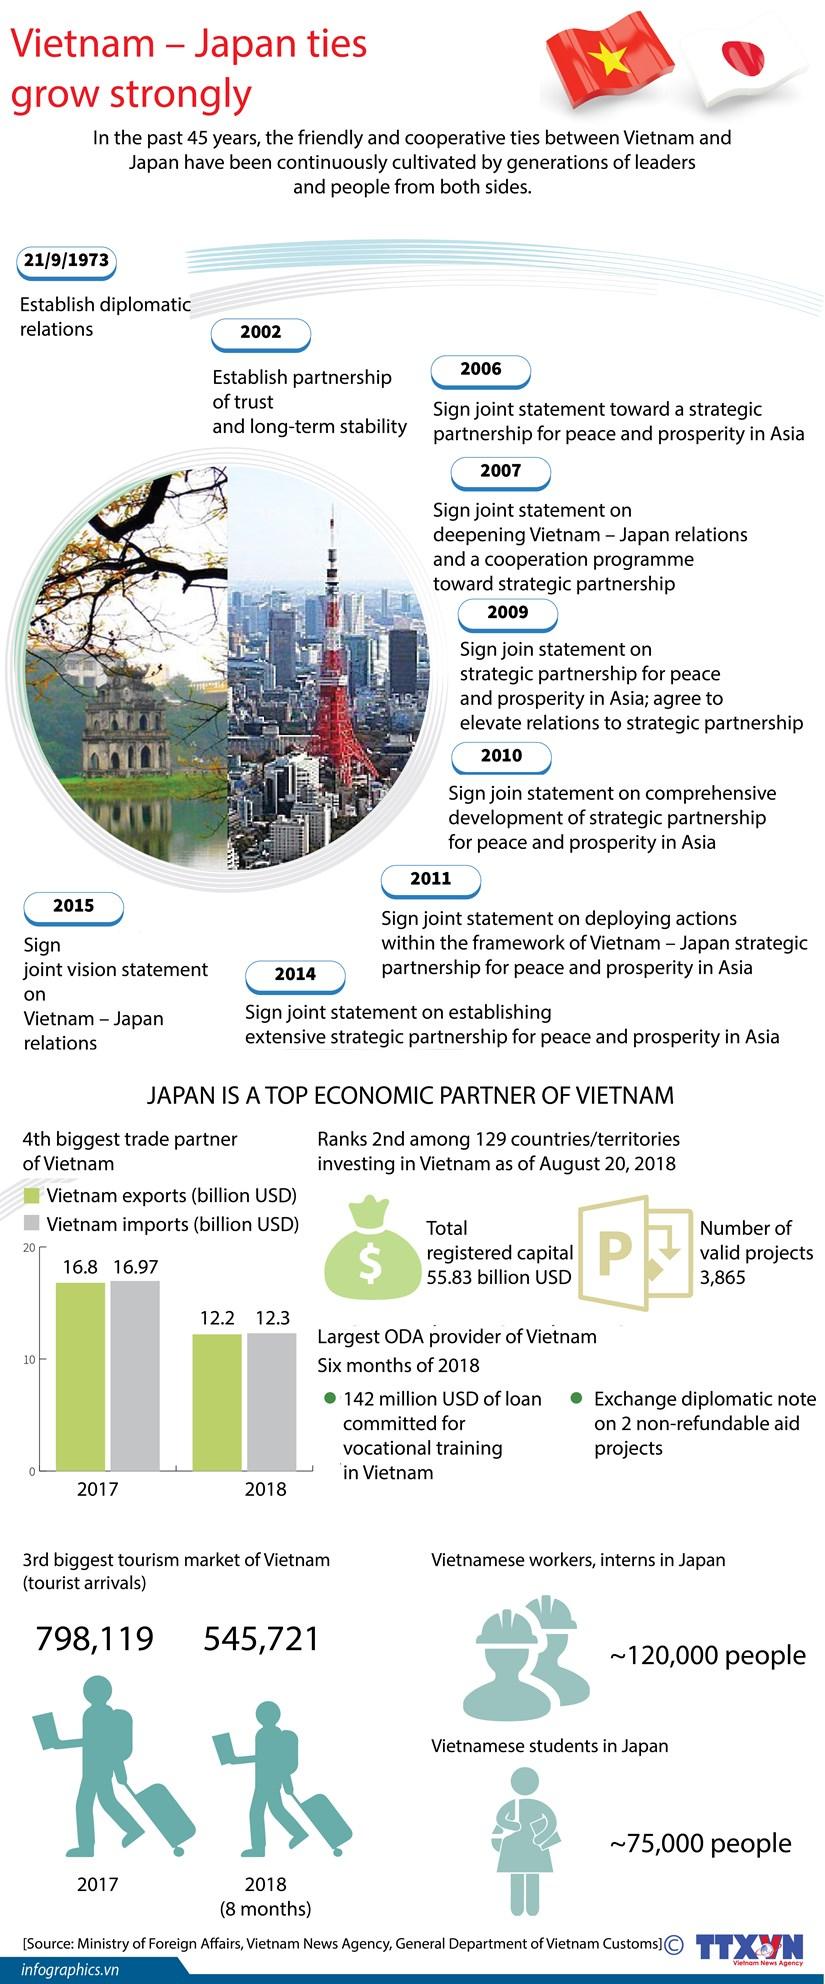 Vietnam - Japan ties grow strongly hinh anh 1